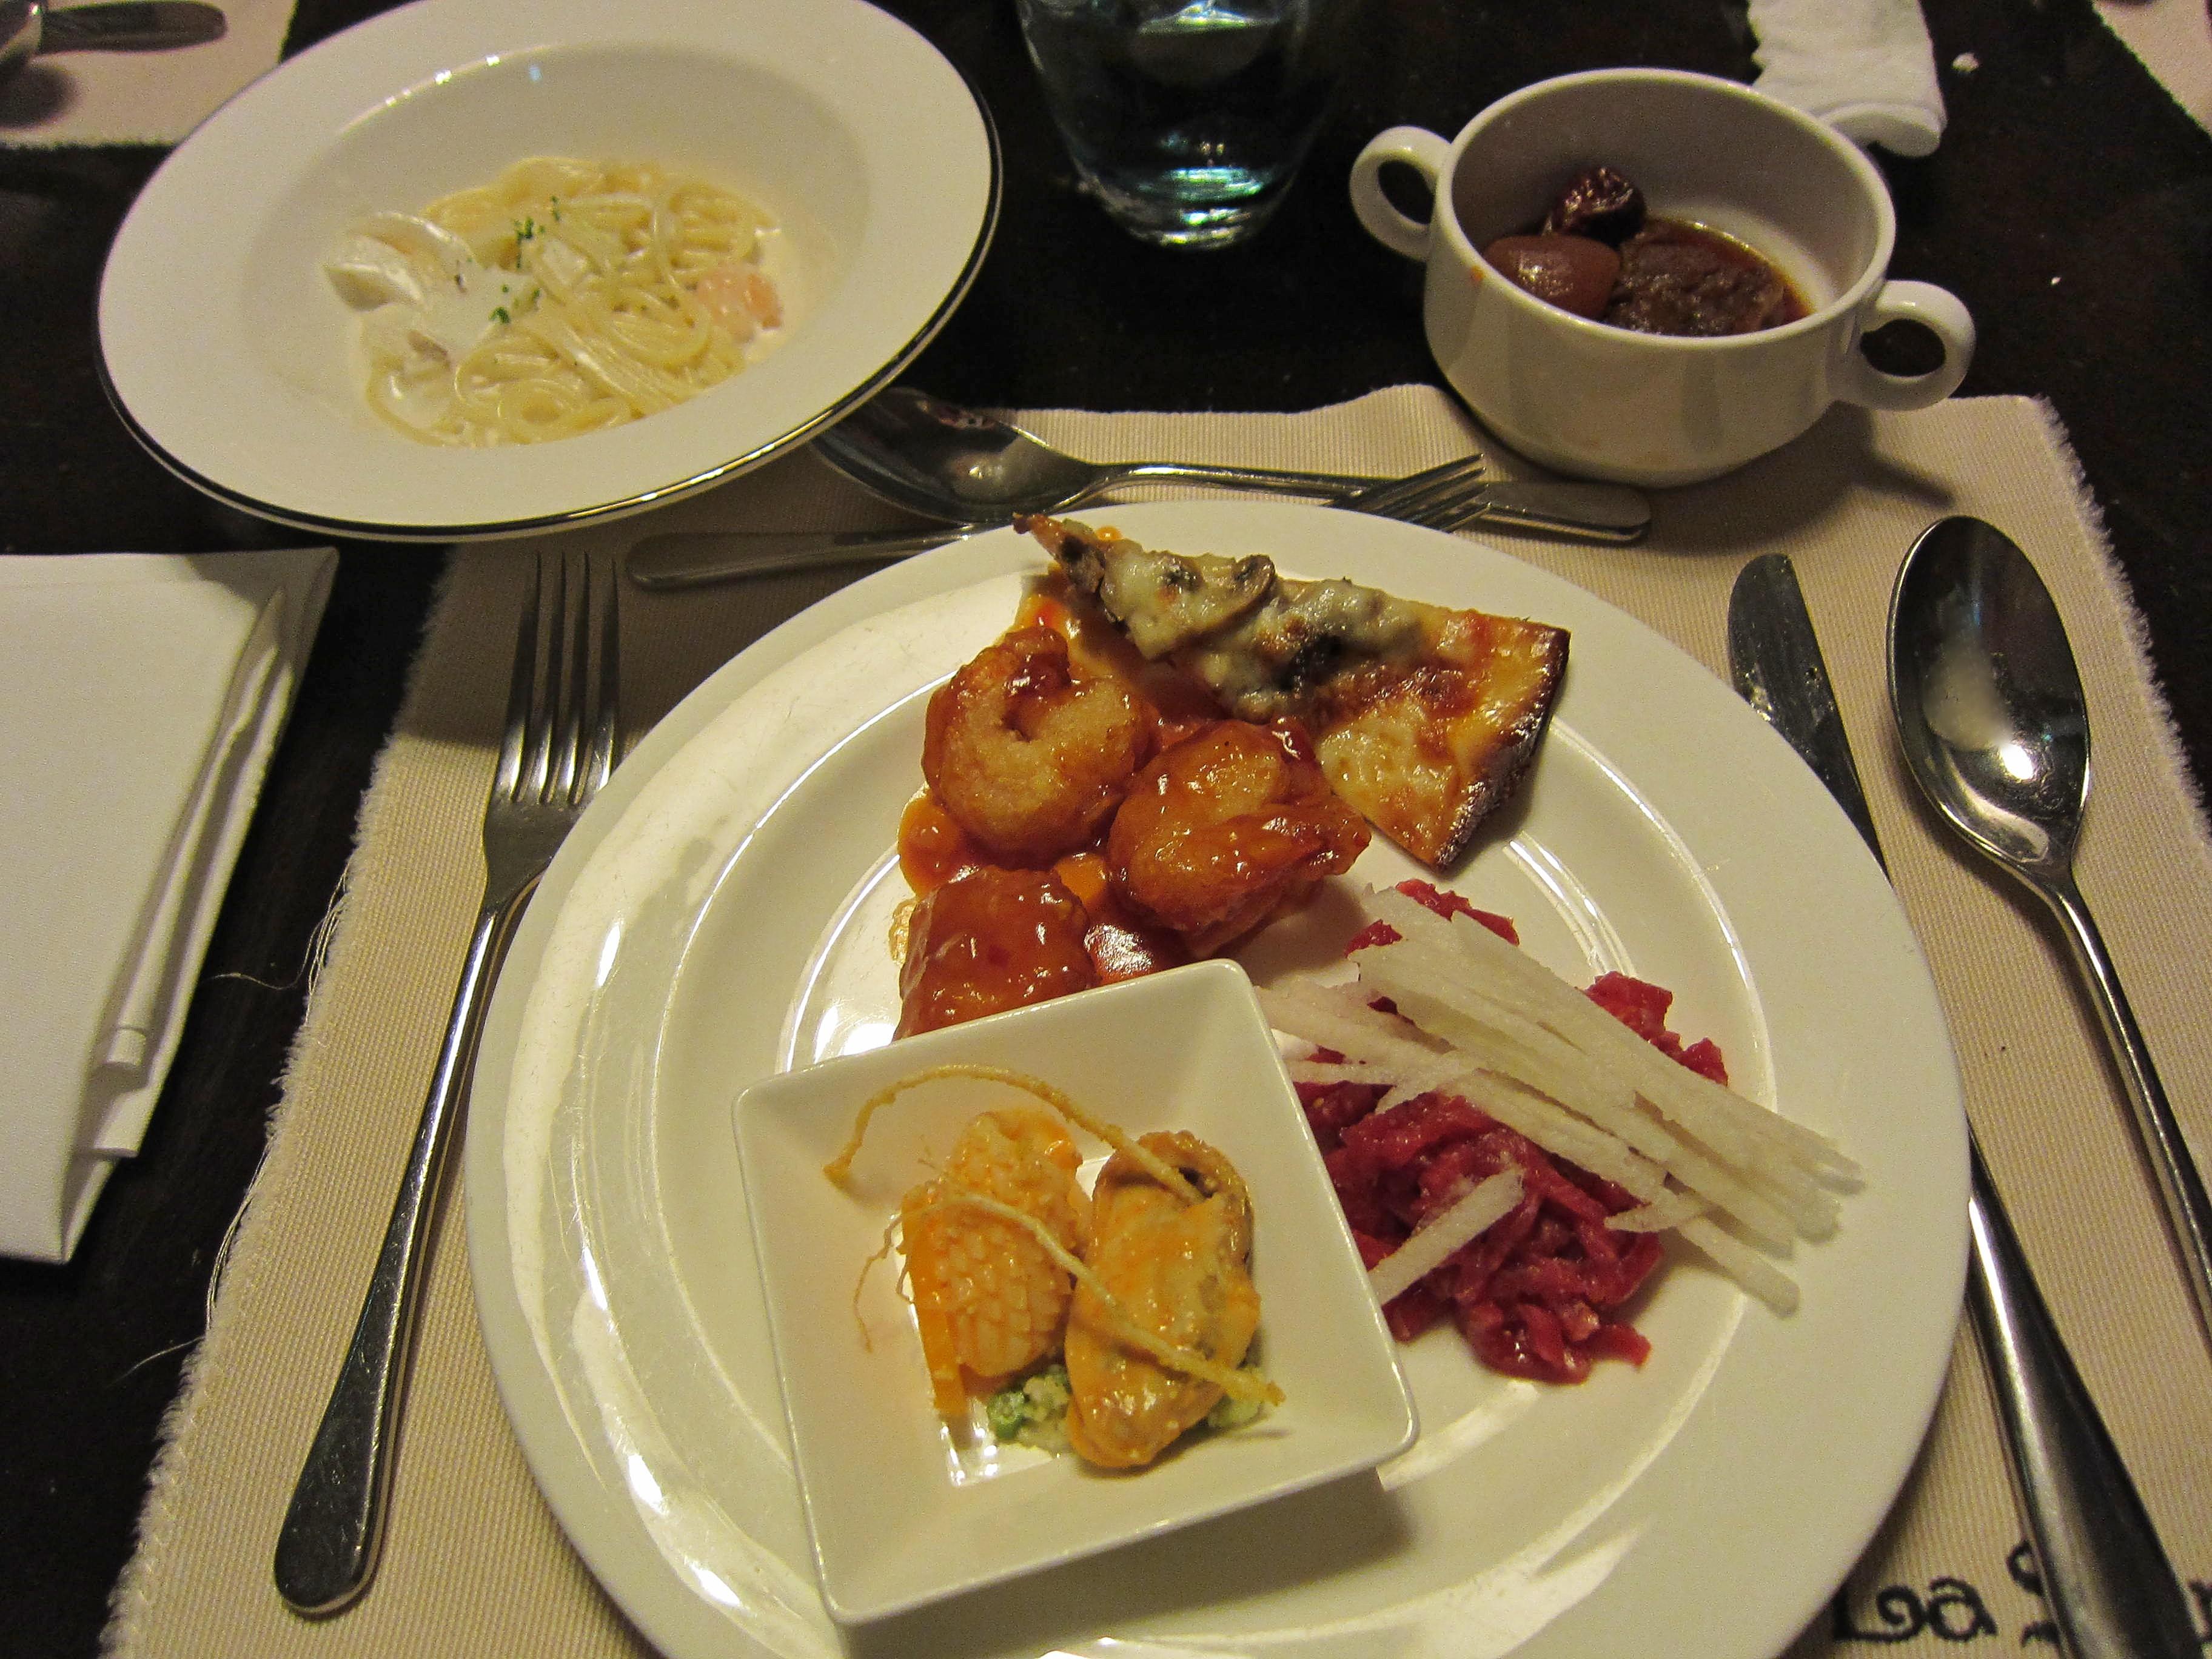 Sumptuous Dinner at Lotte Hotel World's La Seine Buffet ...